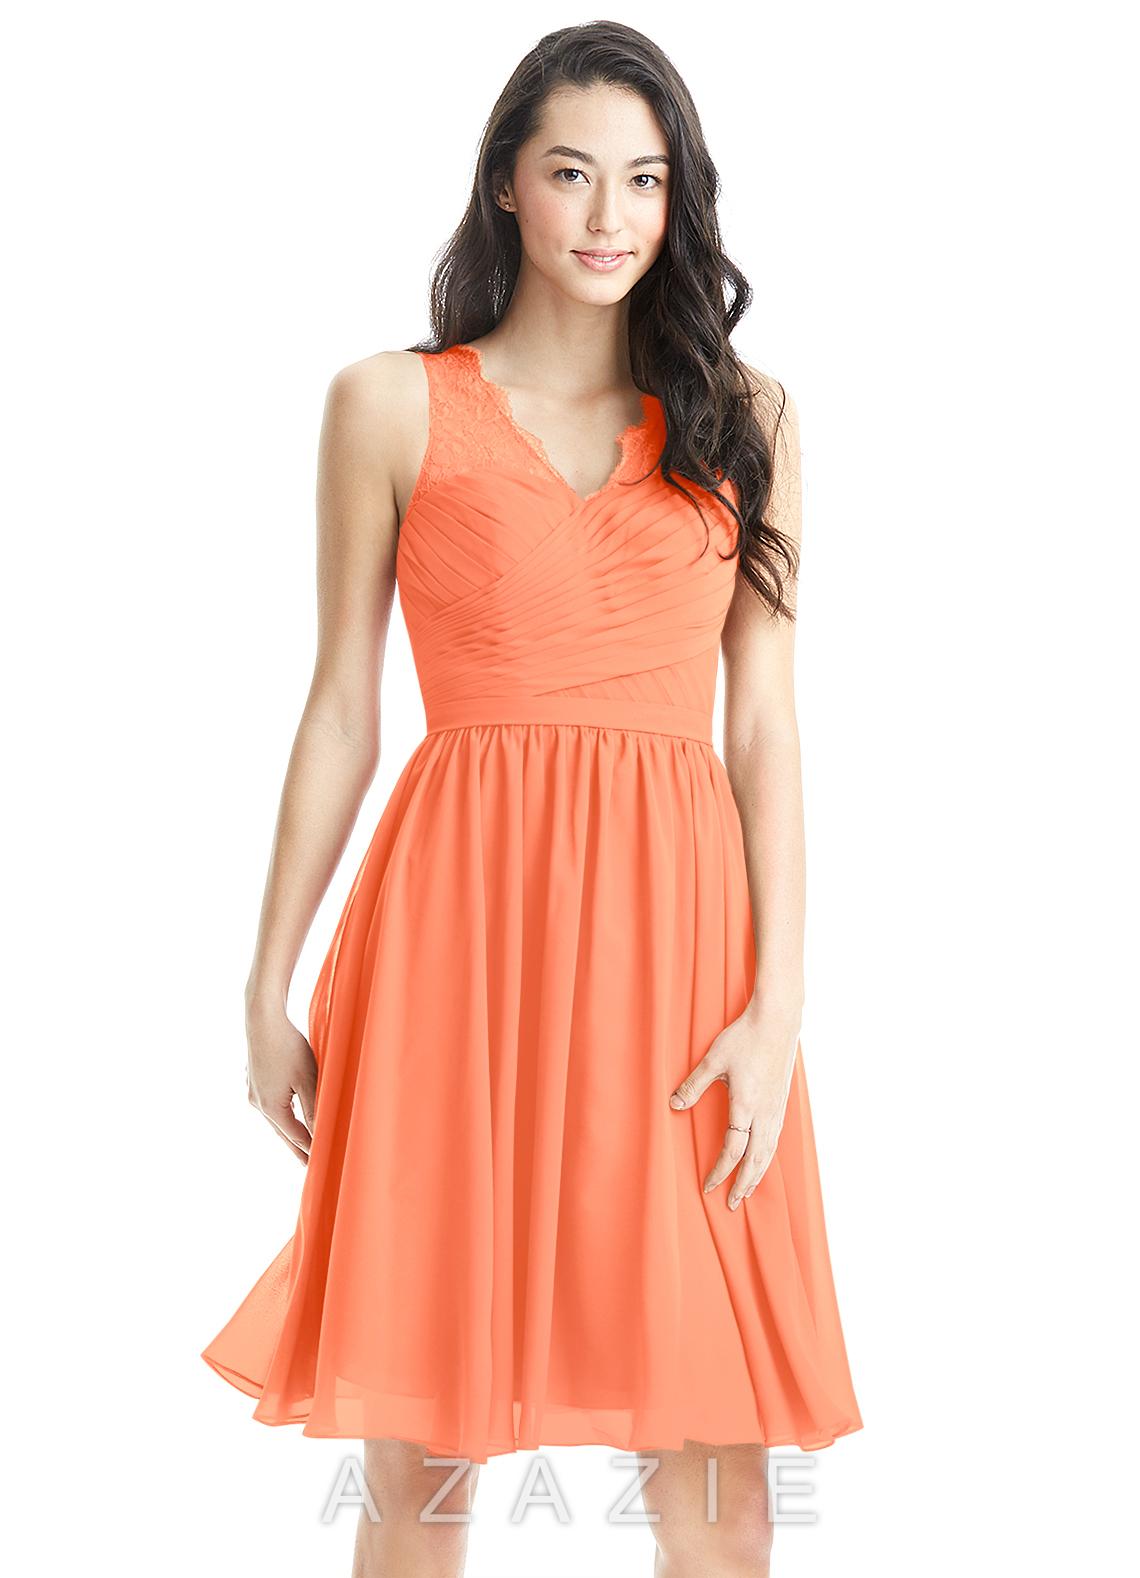 70d1dfe3703 Azazie Heloise Bridesmaid Dress